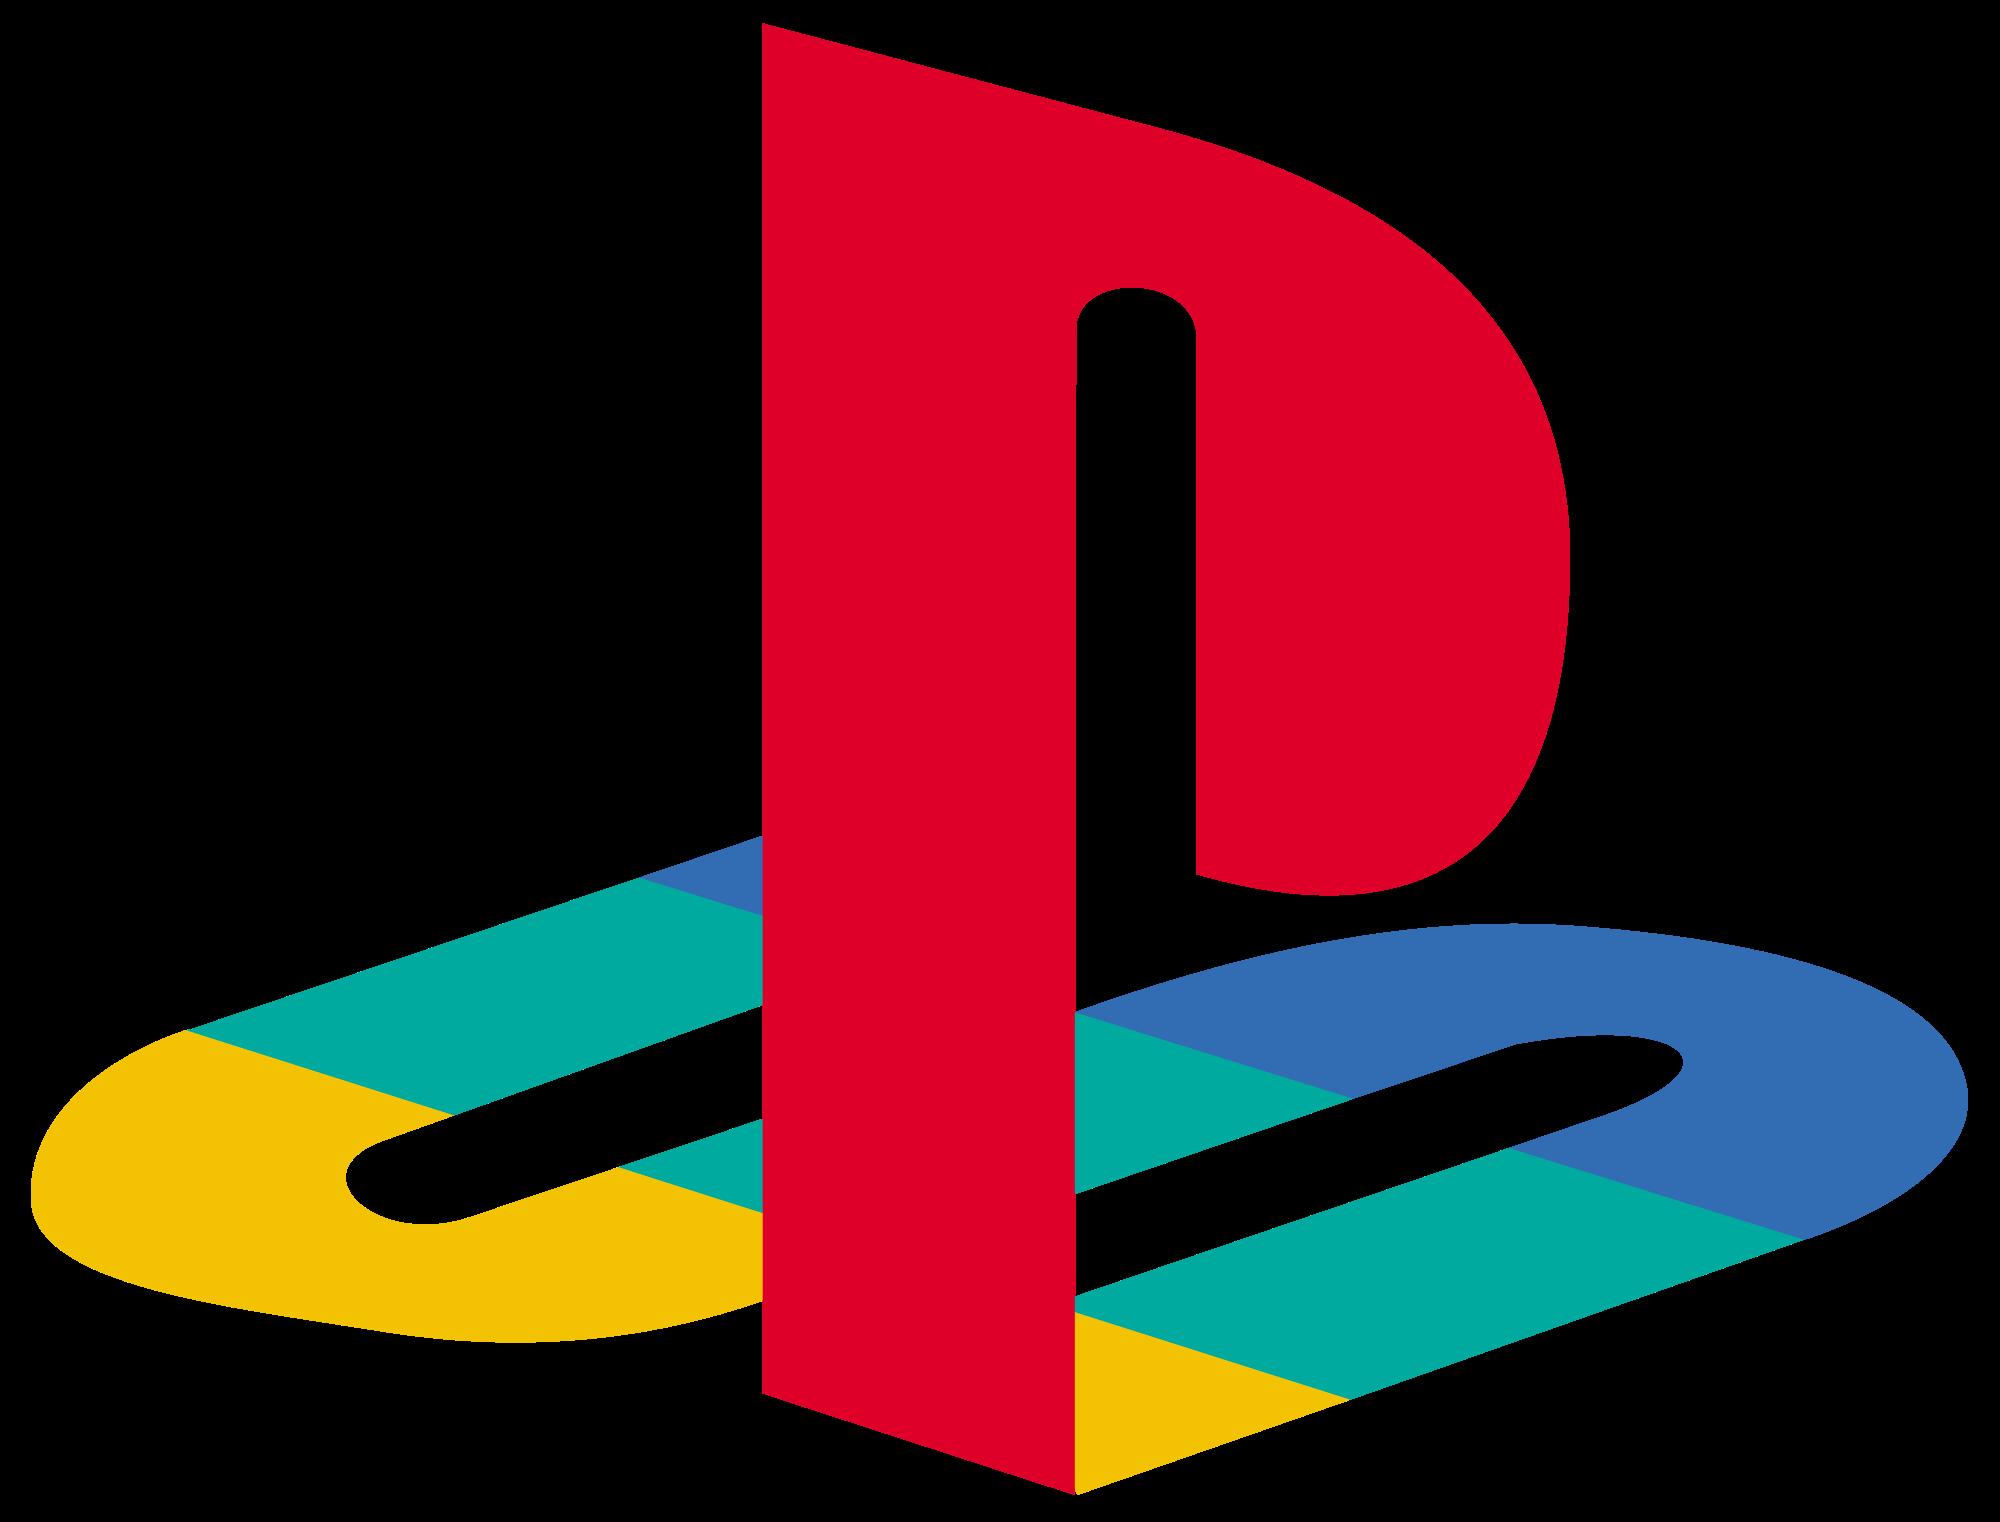 image playstation 1 logo png gta wiki fandom powered by wikia rh gta wikia com playstation 1 logo sticker playstation 1 logo png